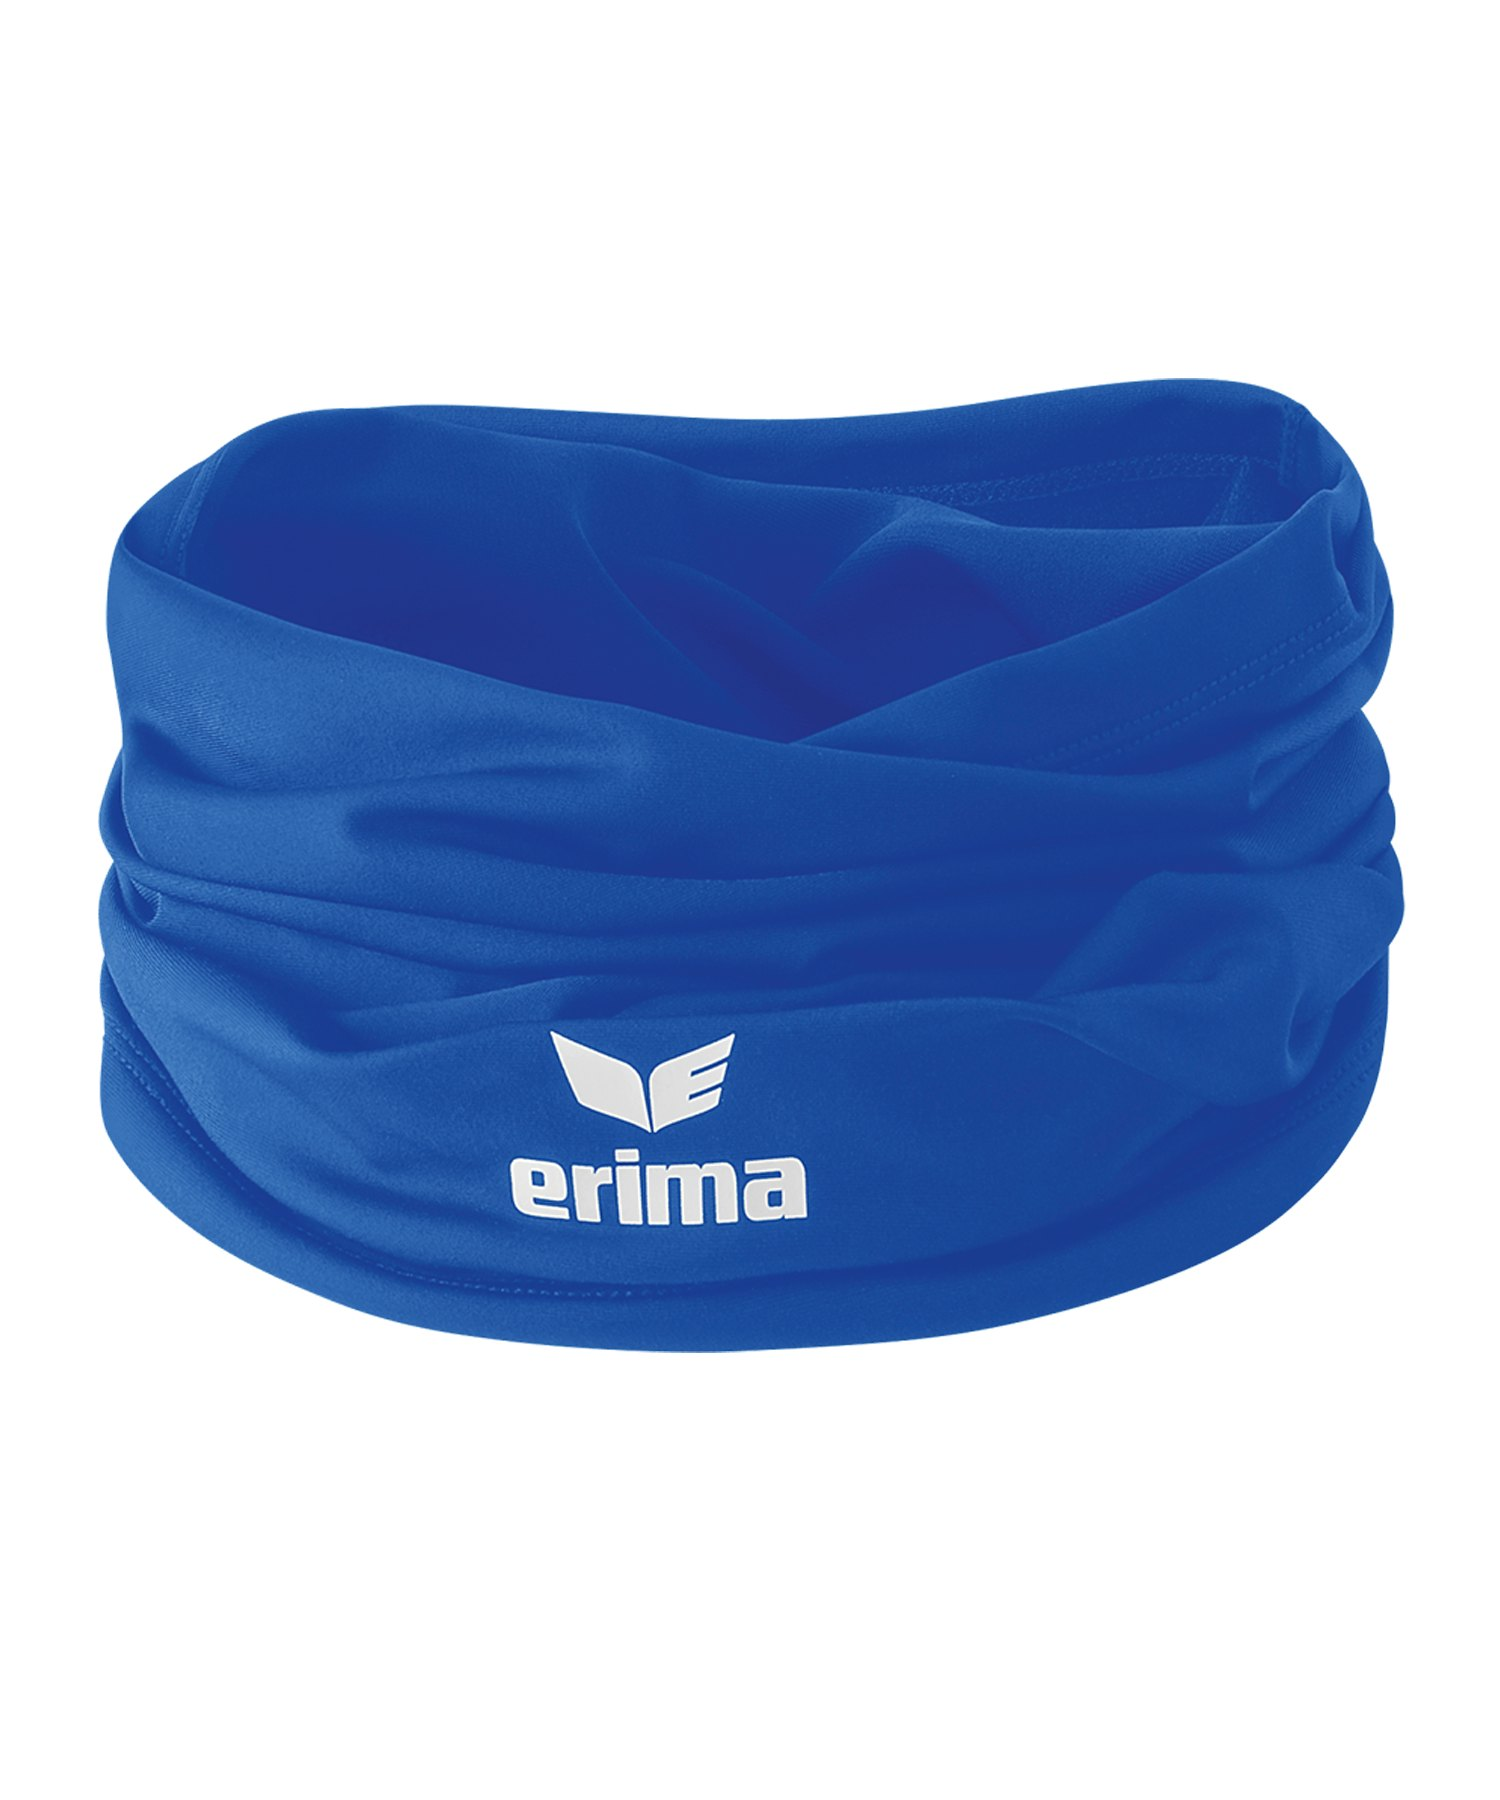 Erima Erima Nackenwärmer Neckwarmer Blau - blau